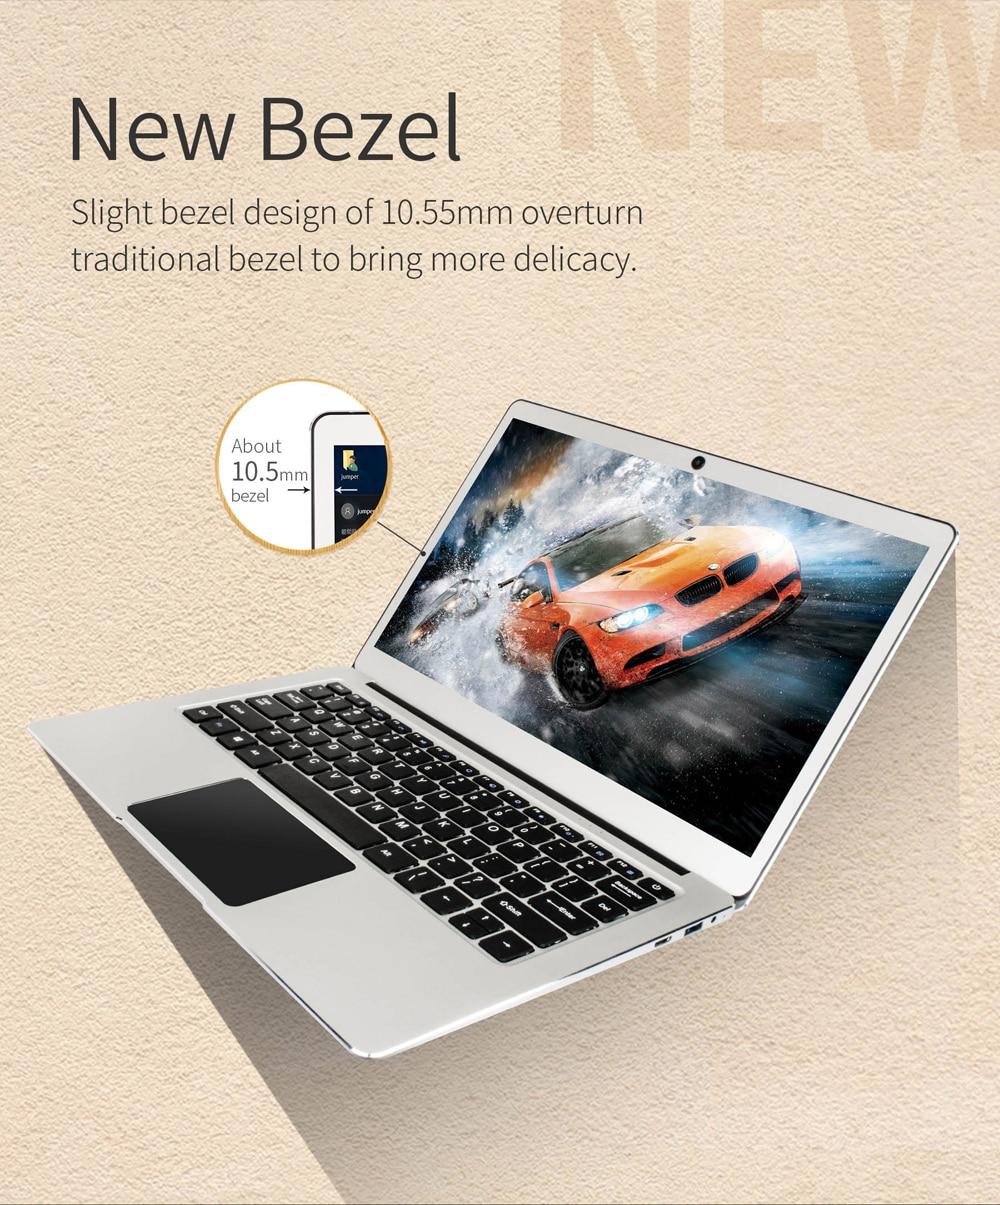 Jumper EZbook 3 Pro Laptop 13.3 Inch IPS Screen Intel J3455 6GB+64GB Notebook 2.4G/5G WiFi With M.2 SATA SSD Slot